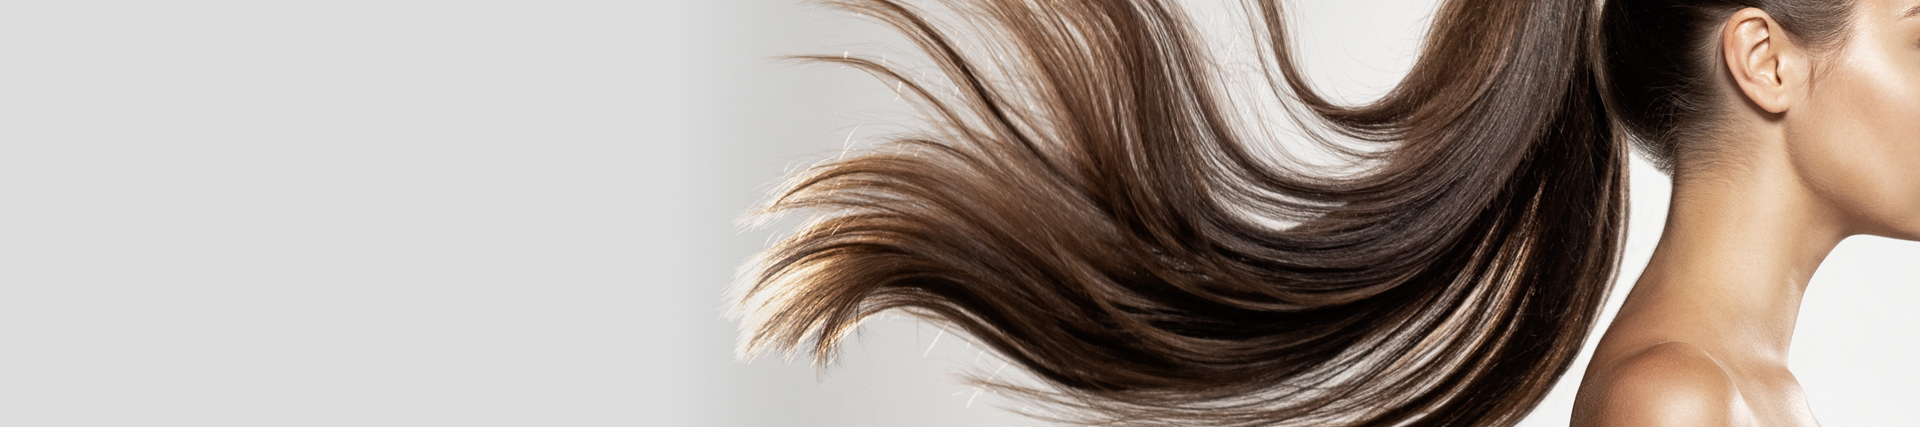 Hair Loss Treatments Sesderma